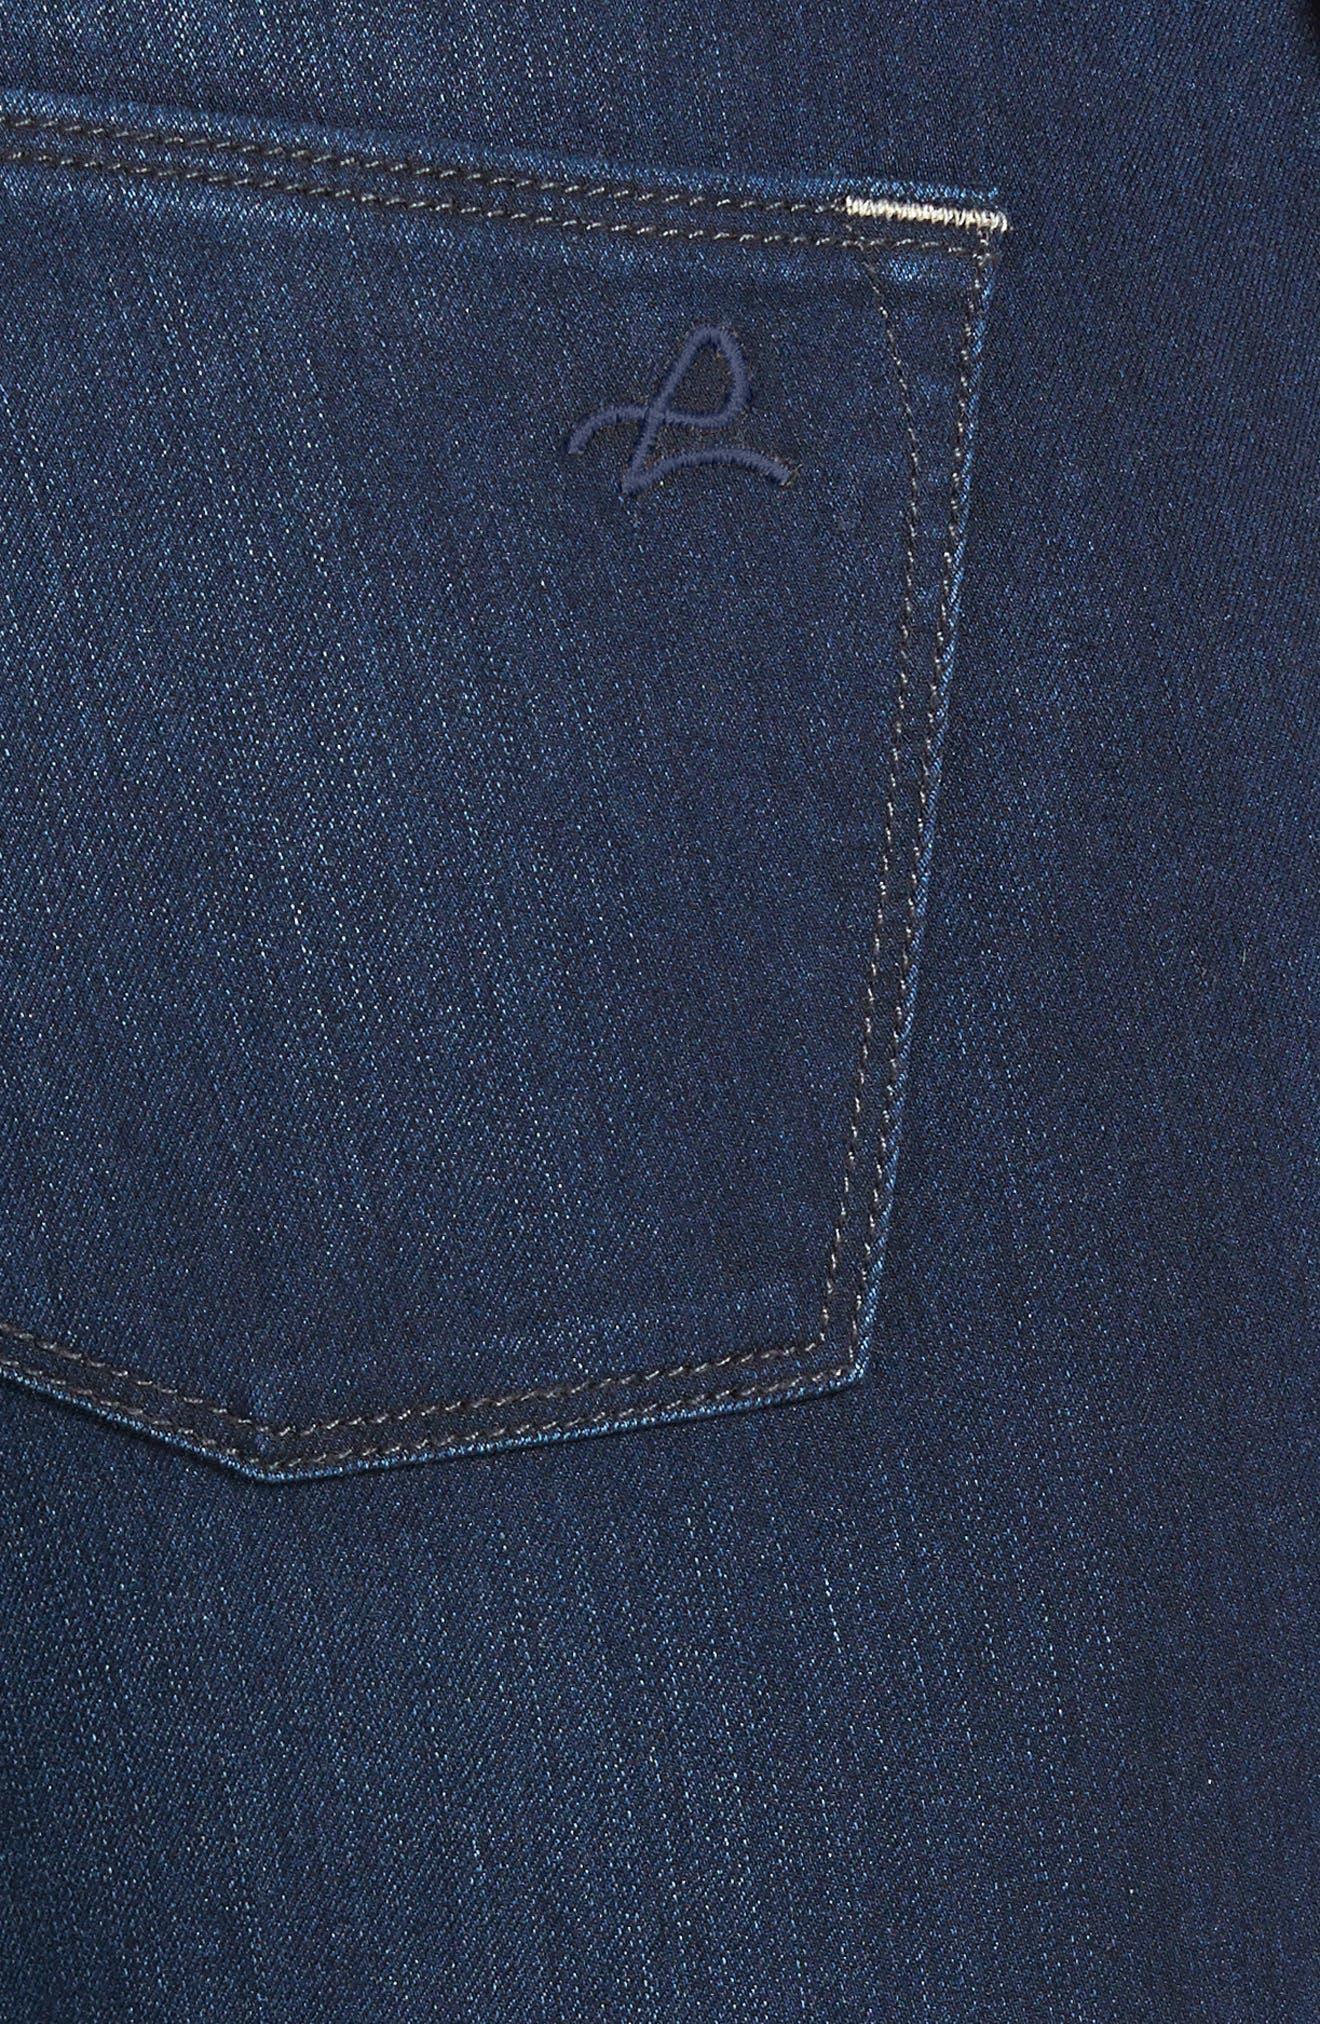 'Grace' Straight Jeans,                             Alternate thumbnail 9, color,                             405